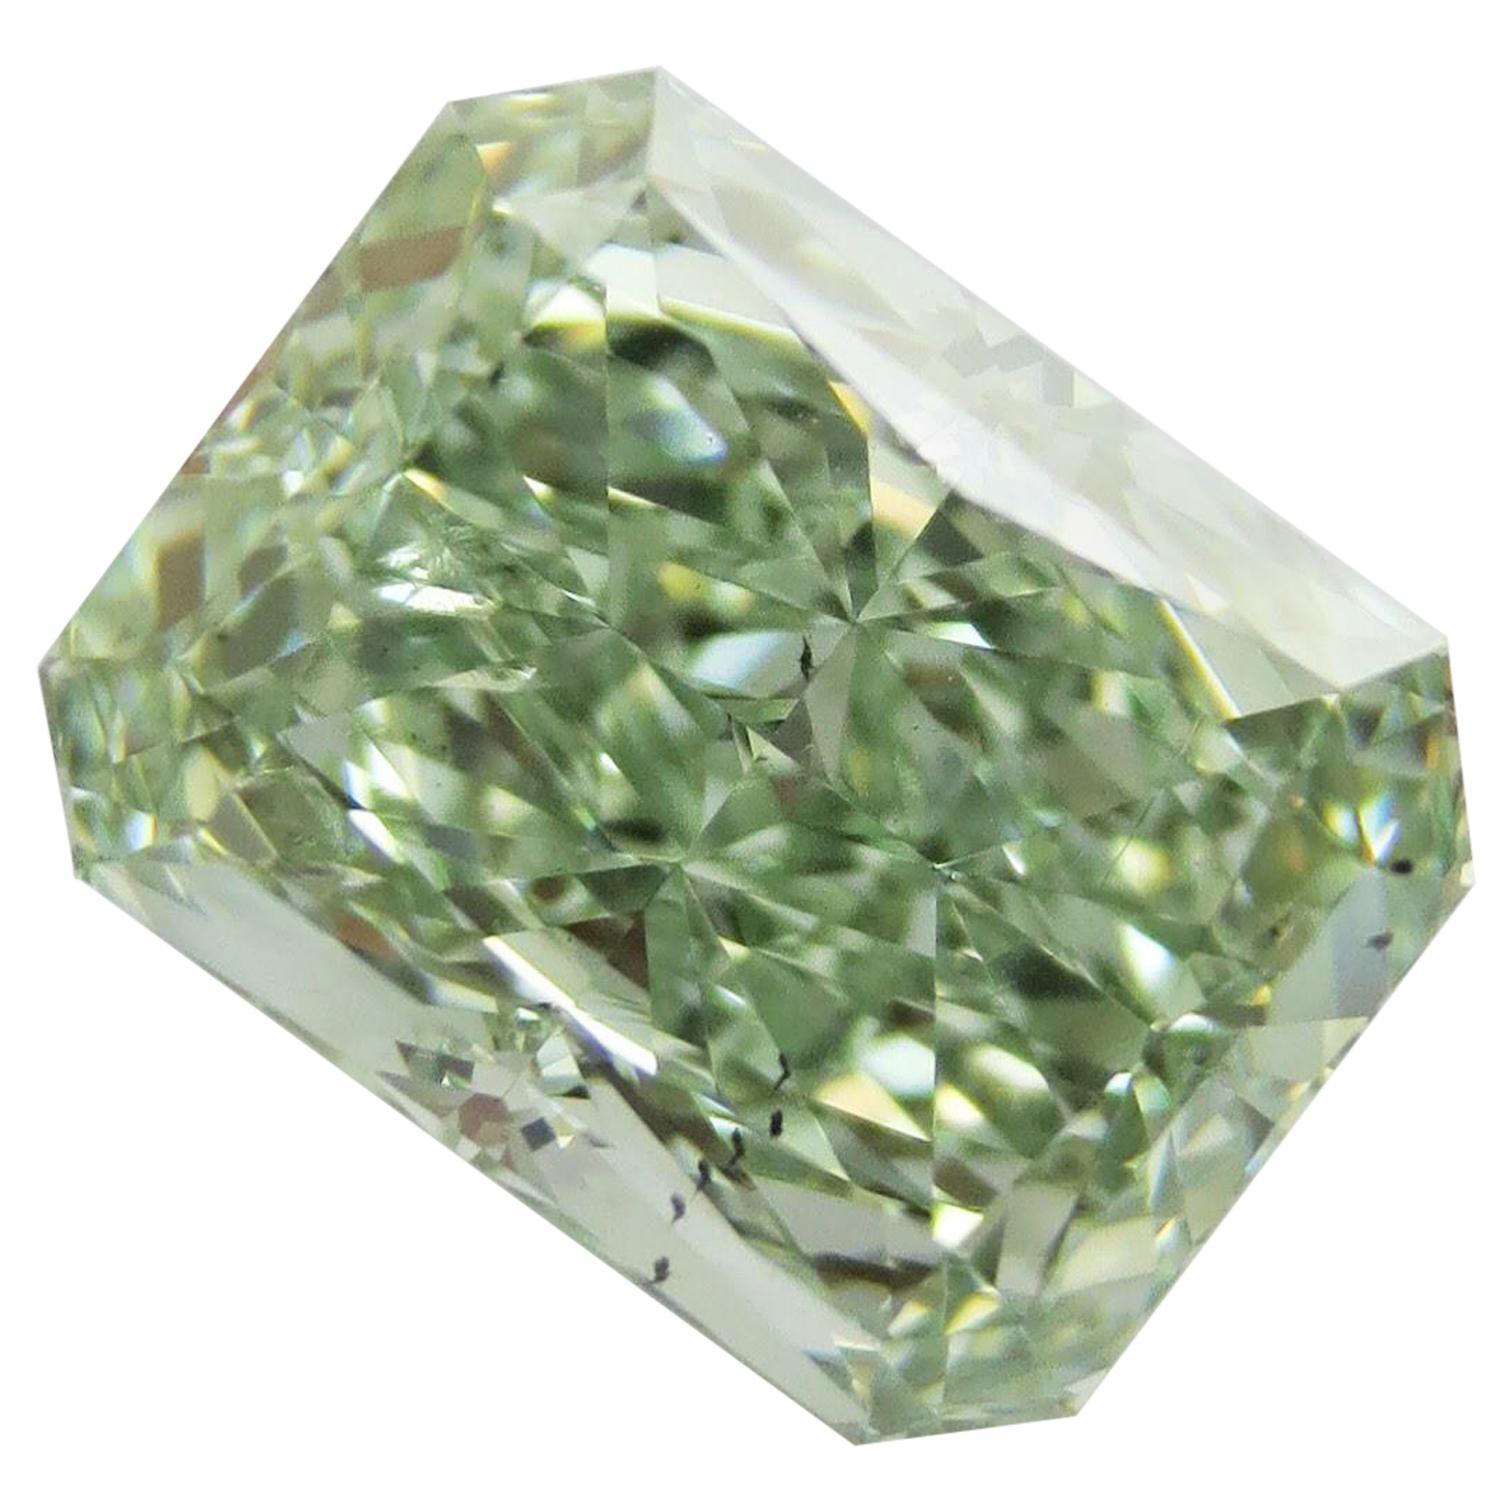 Emilio Jewelry GIA Certified 3.00 Carat Fancy Intense Yellowish Green Diamond